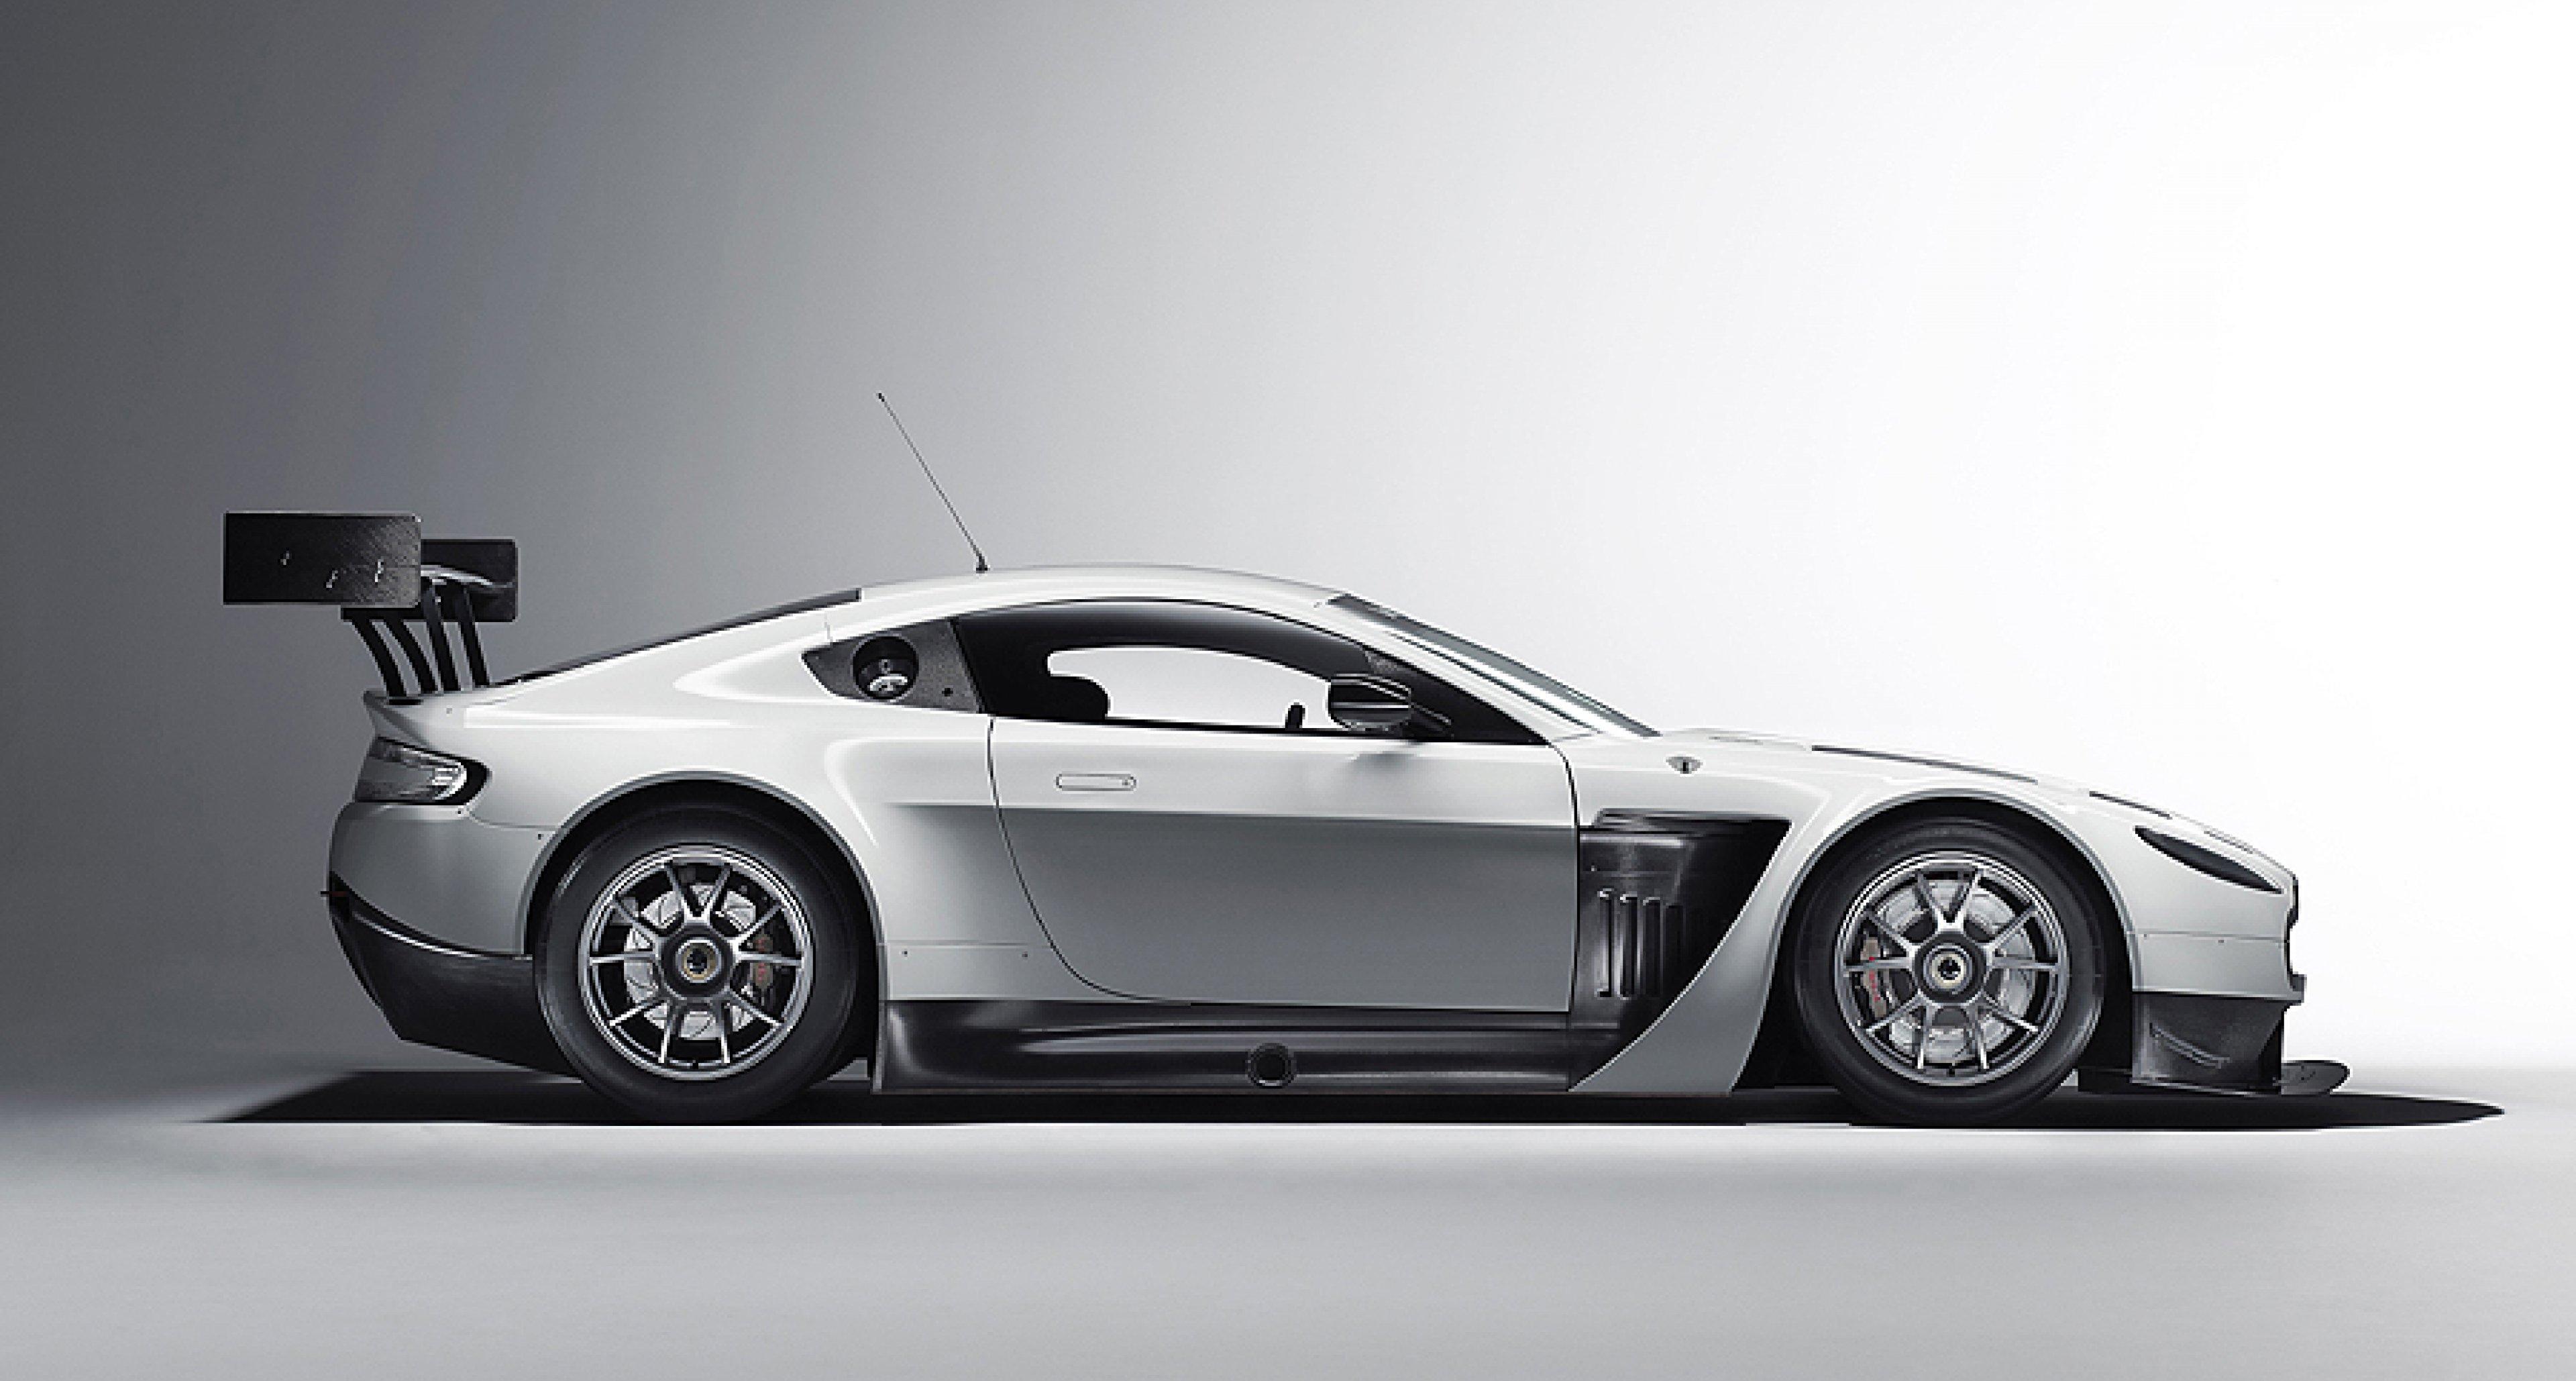 V12 Vantage GT3: Aston Martin Racing tests begin